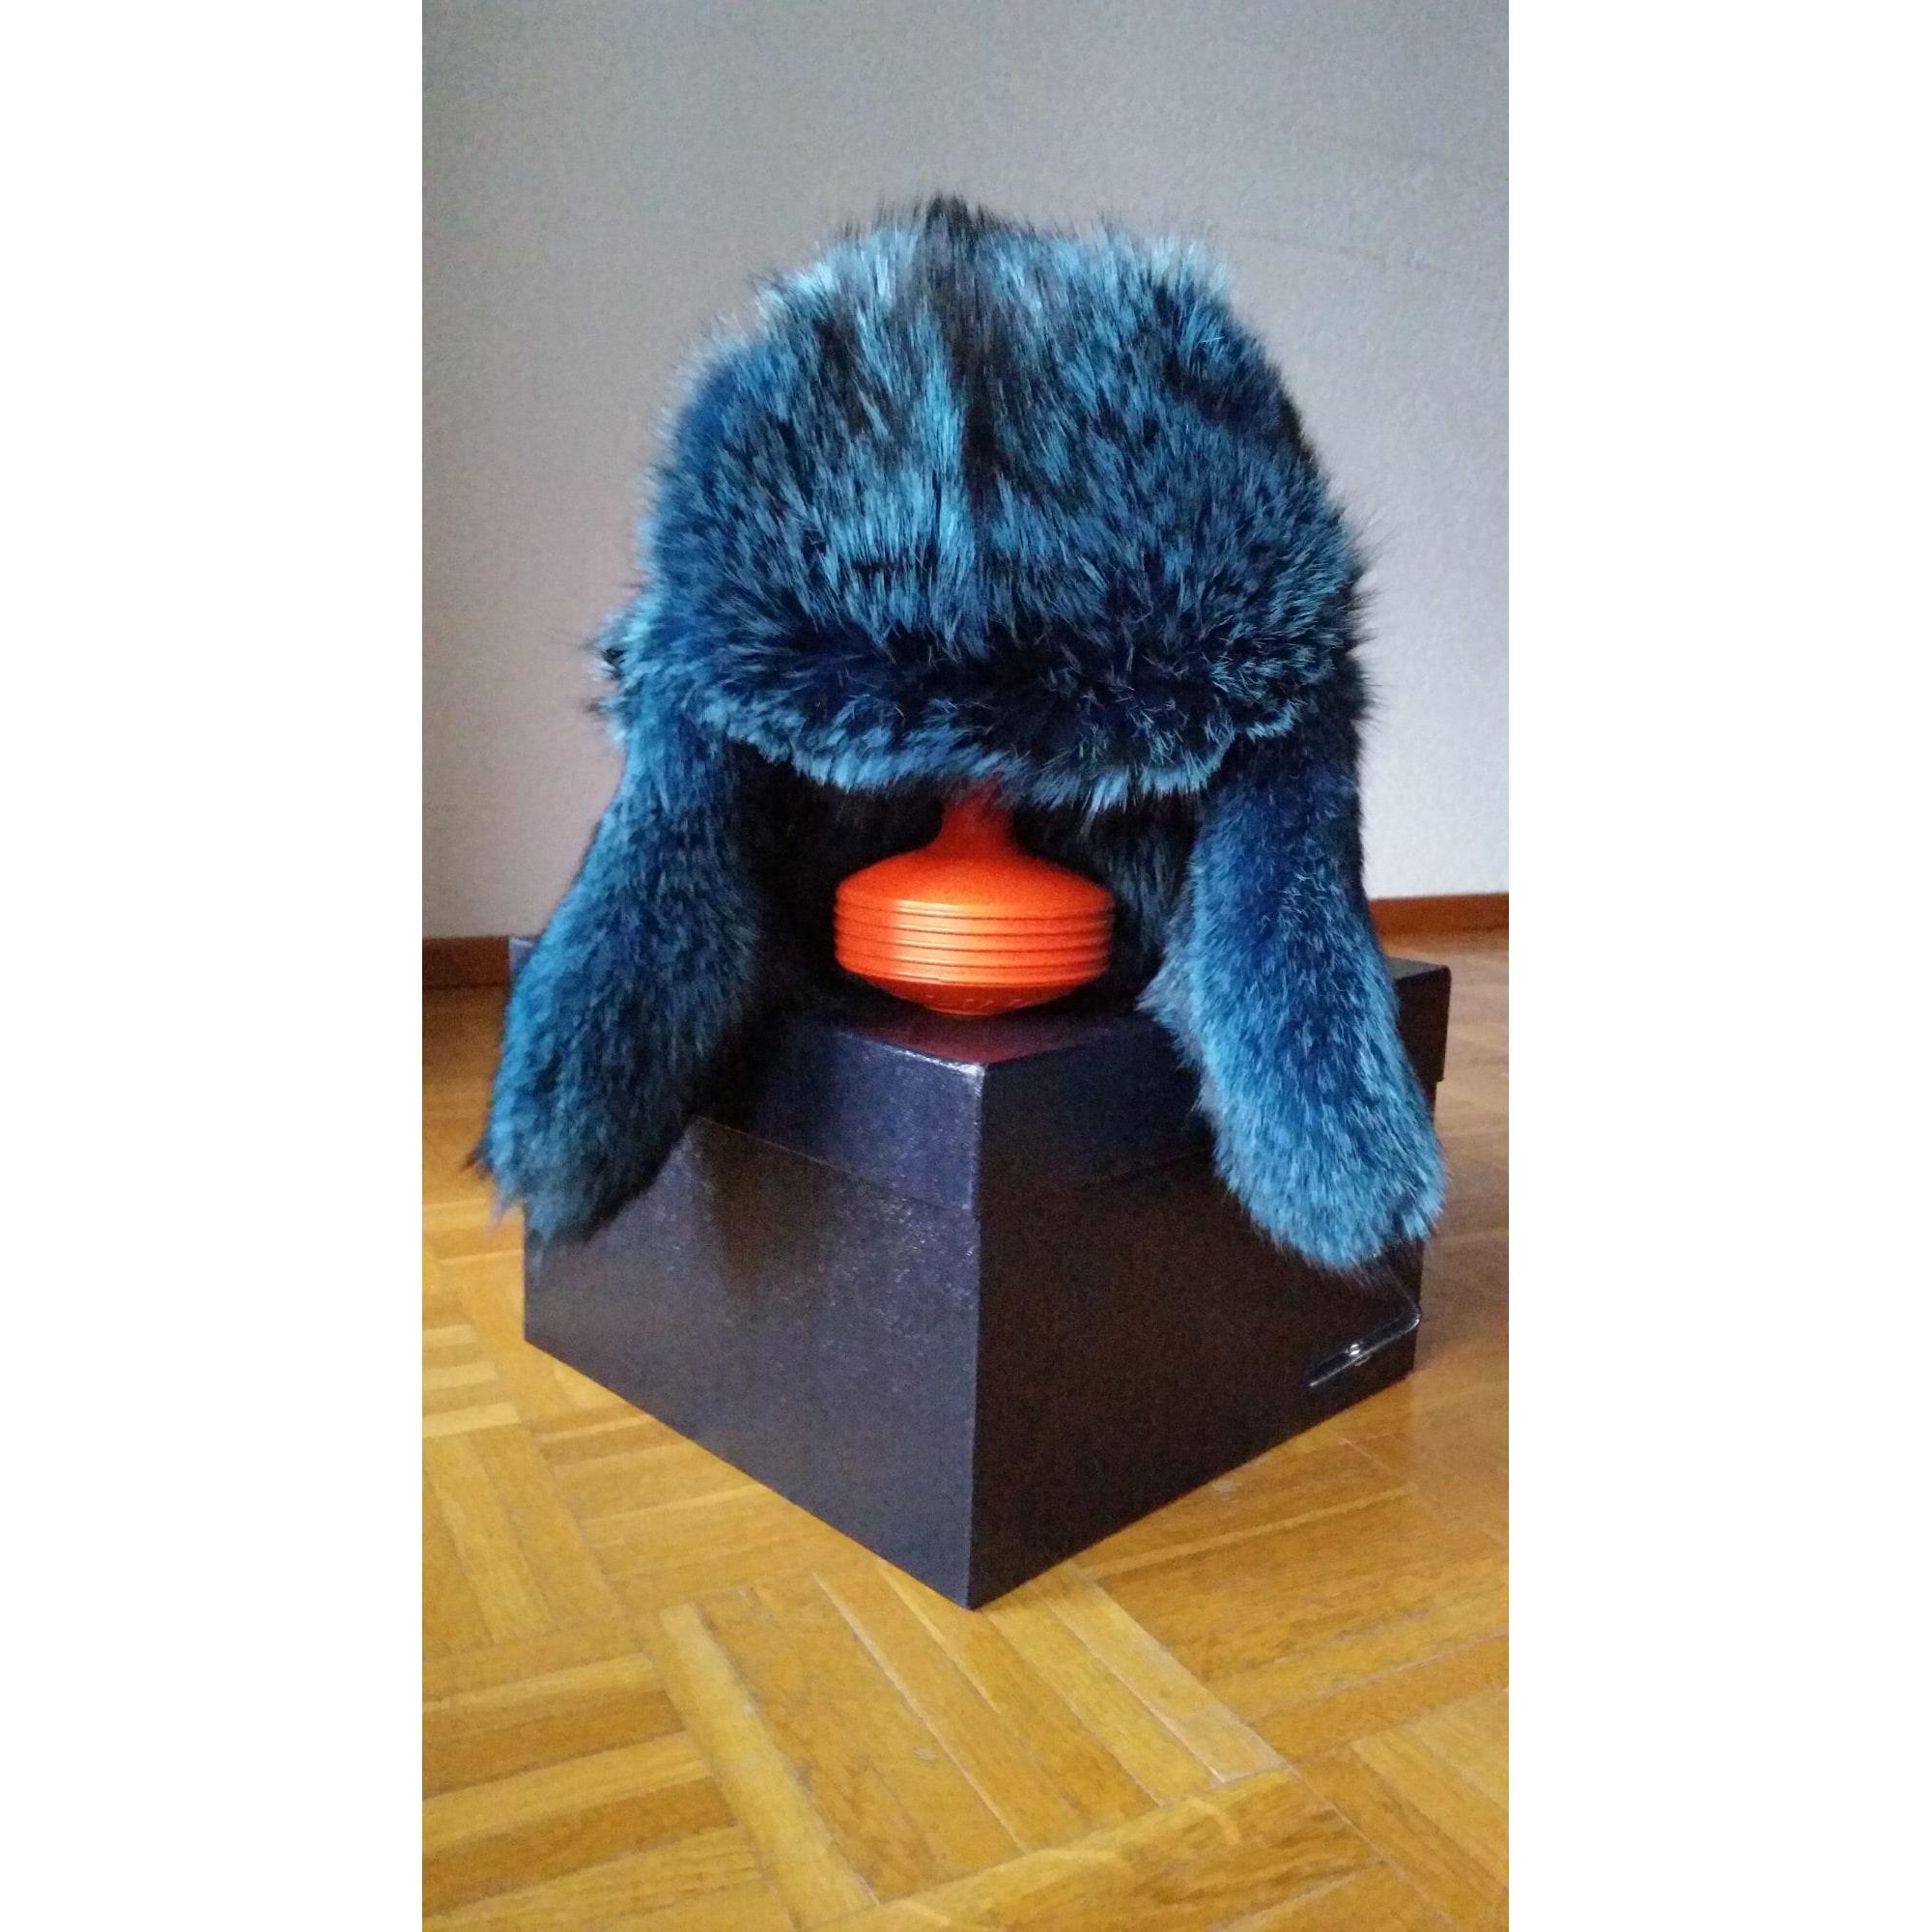 Chapeau PRADA Bleu, bleu marine, bleu turquoise